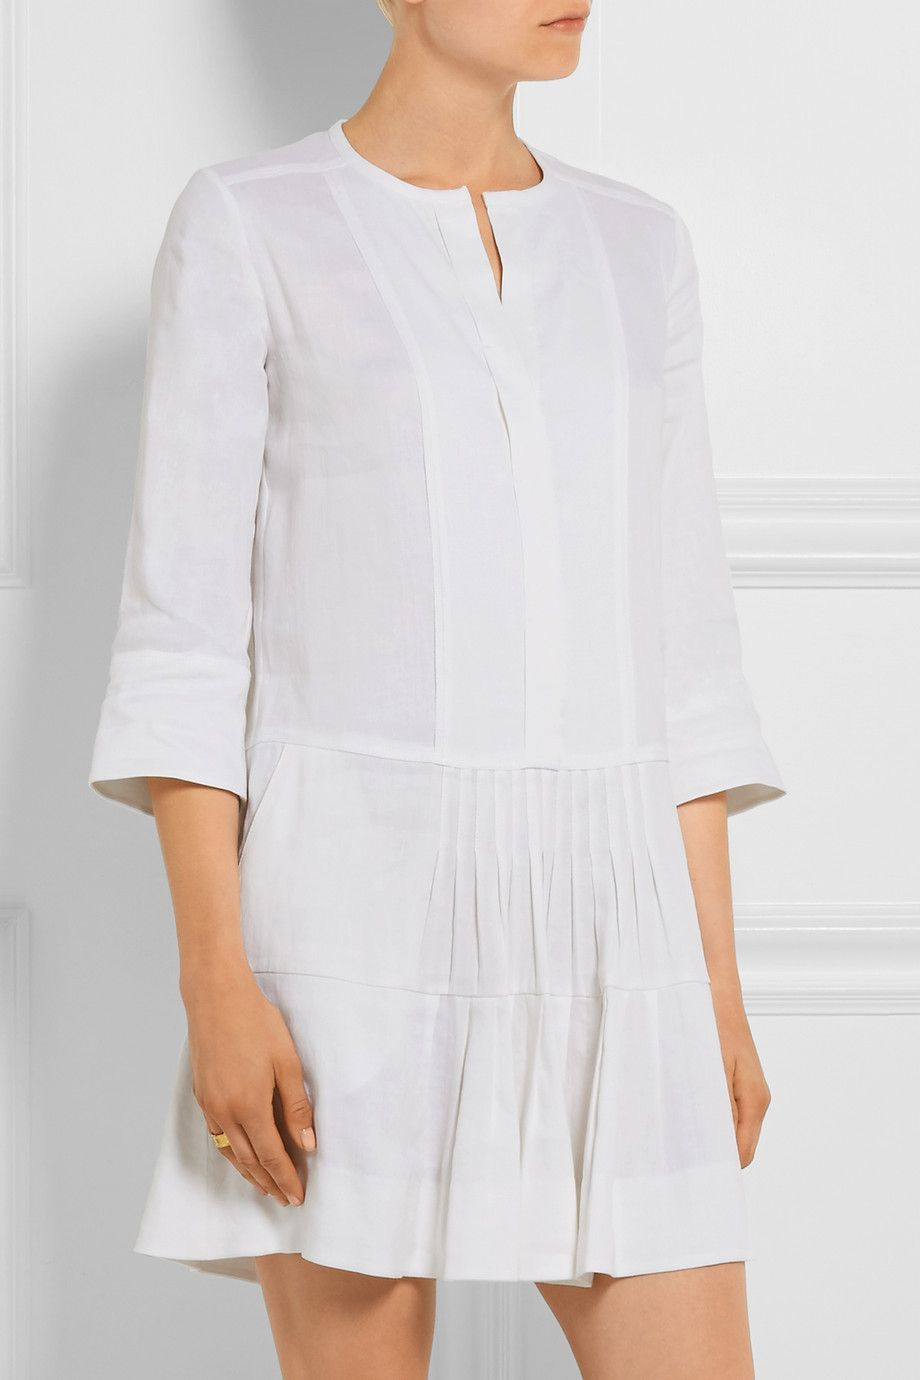 Off White Pleated Stretch Linen Blend Mini Dress Vince White Dress Spring Linen Blend Mini Dress [ 1380 x 920 Pixel ]